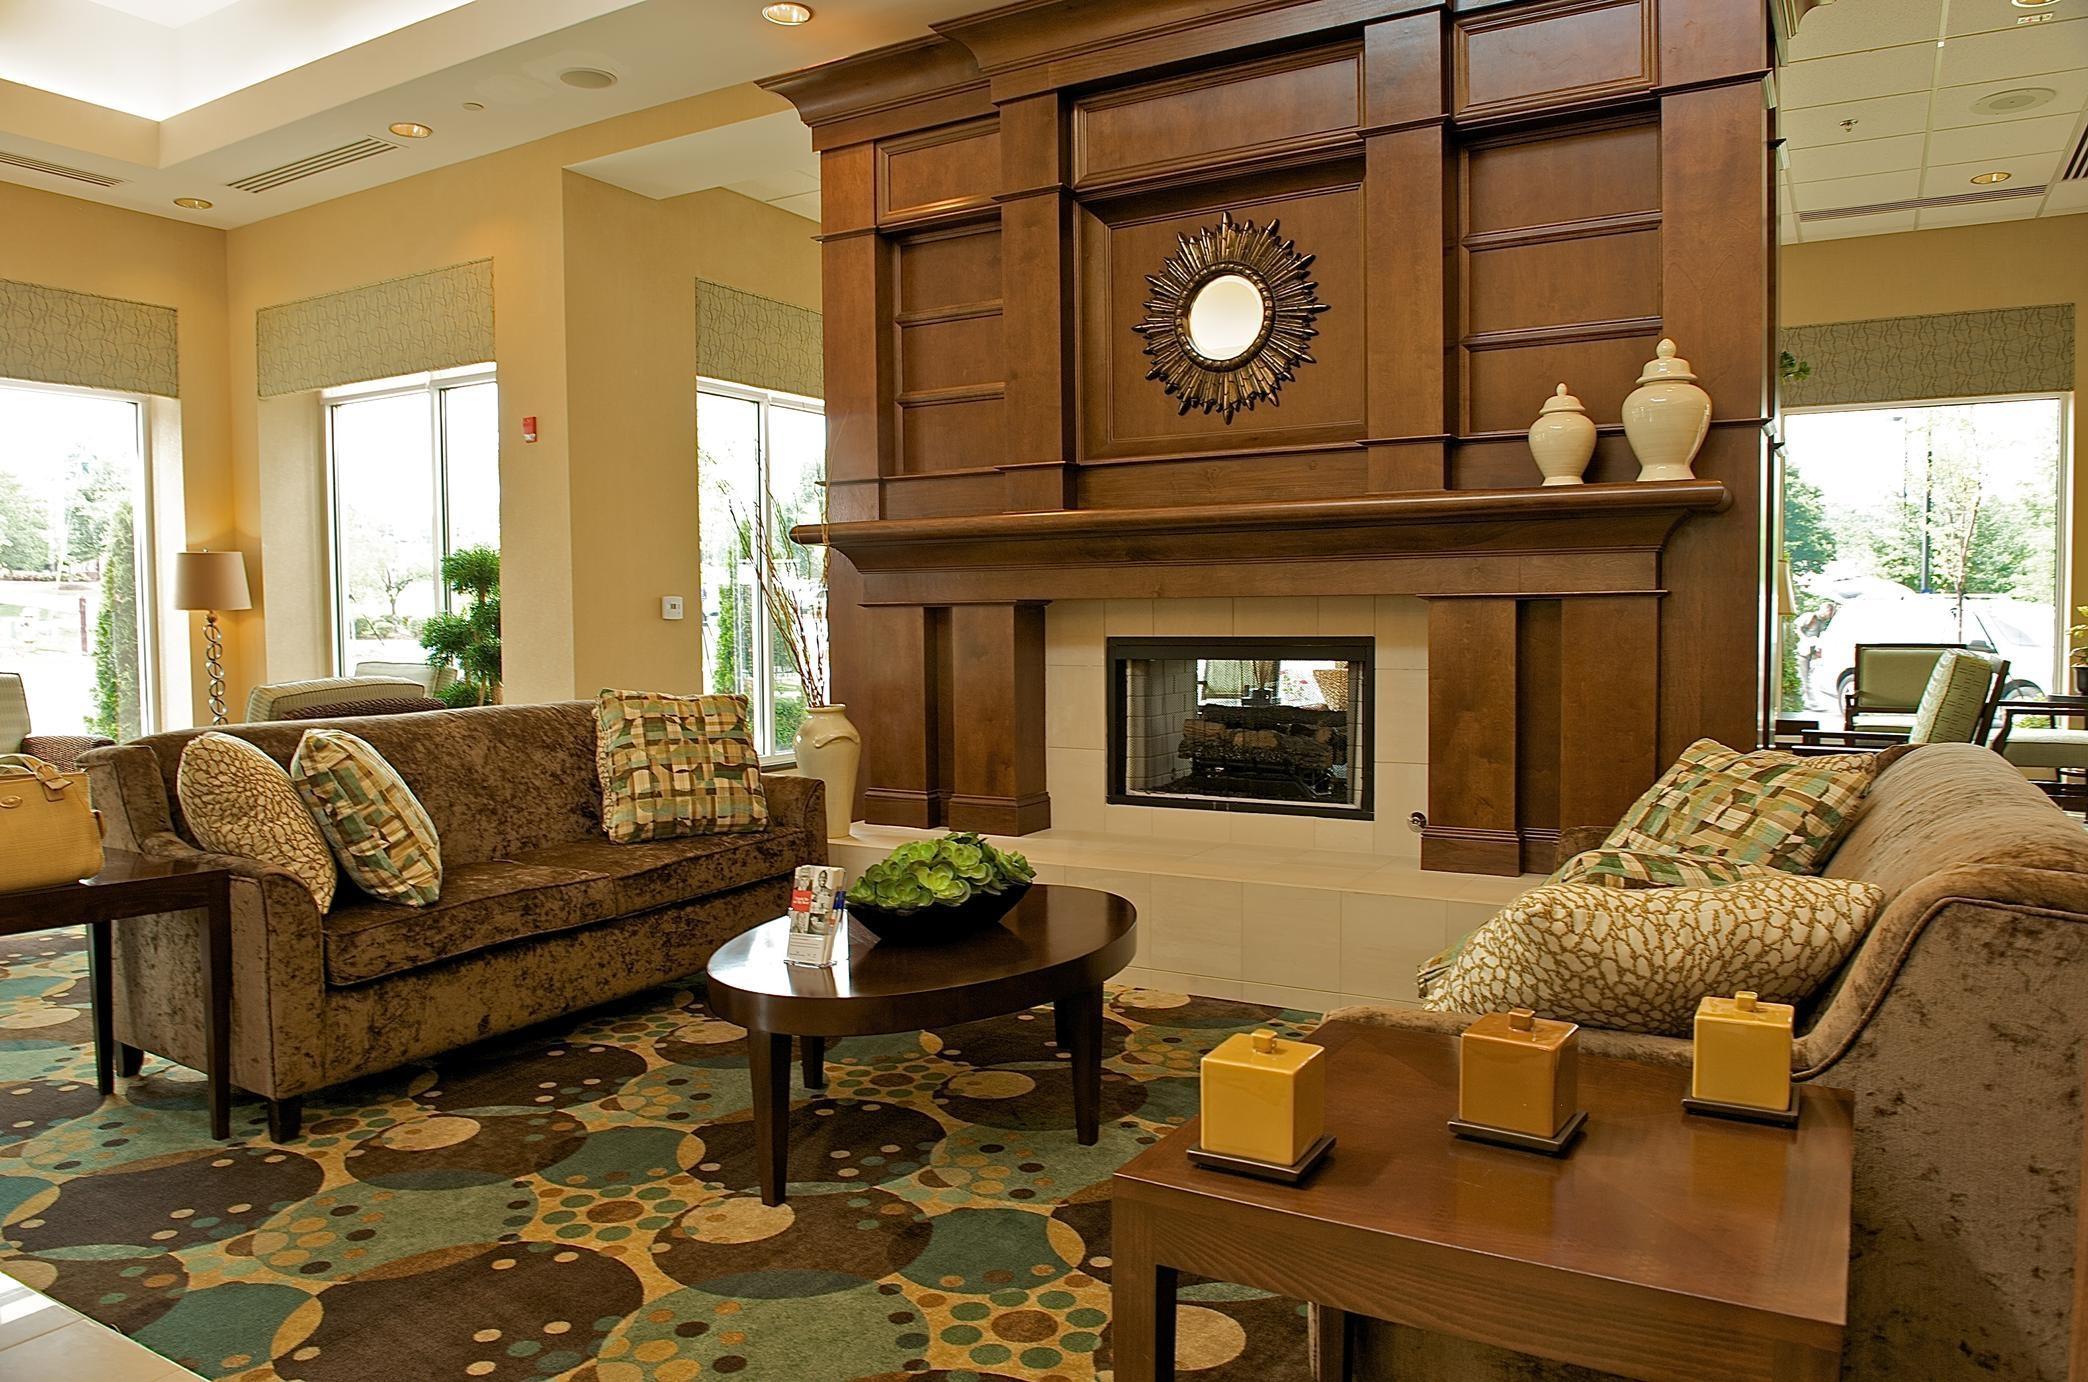 Hilton Garden Inn Gainesville image 3